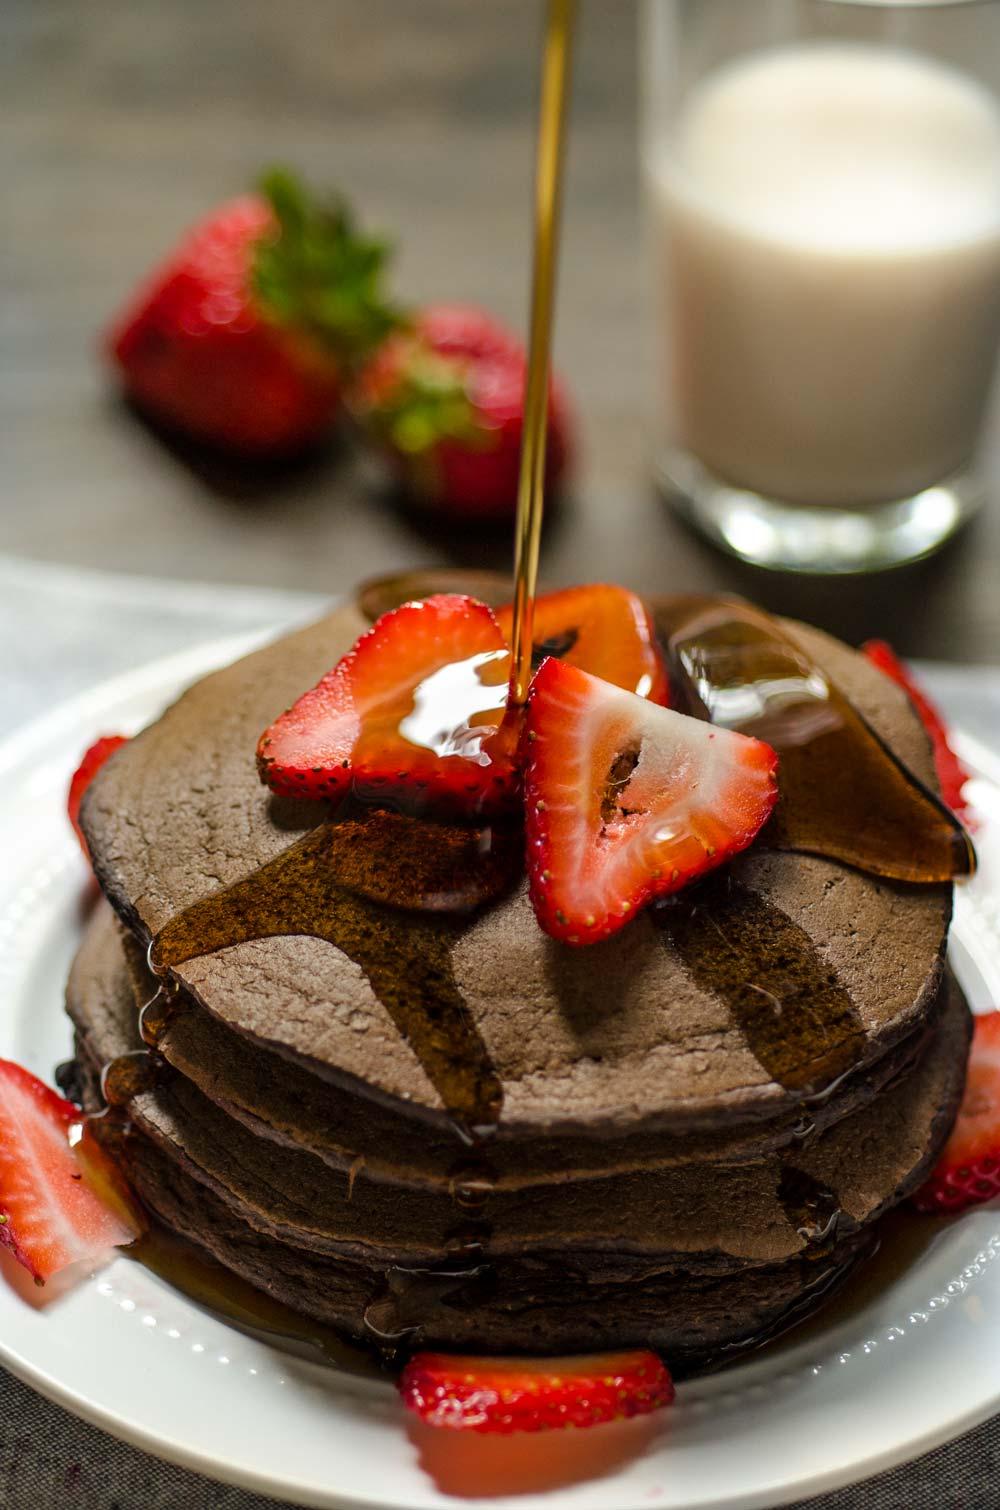 Tommy S Vegan Chocolate Strawberry Pancakes Dora S Table